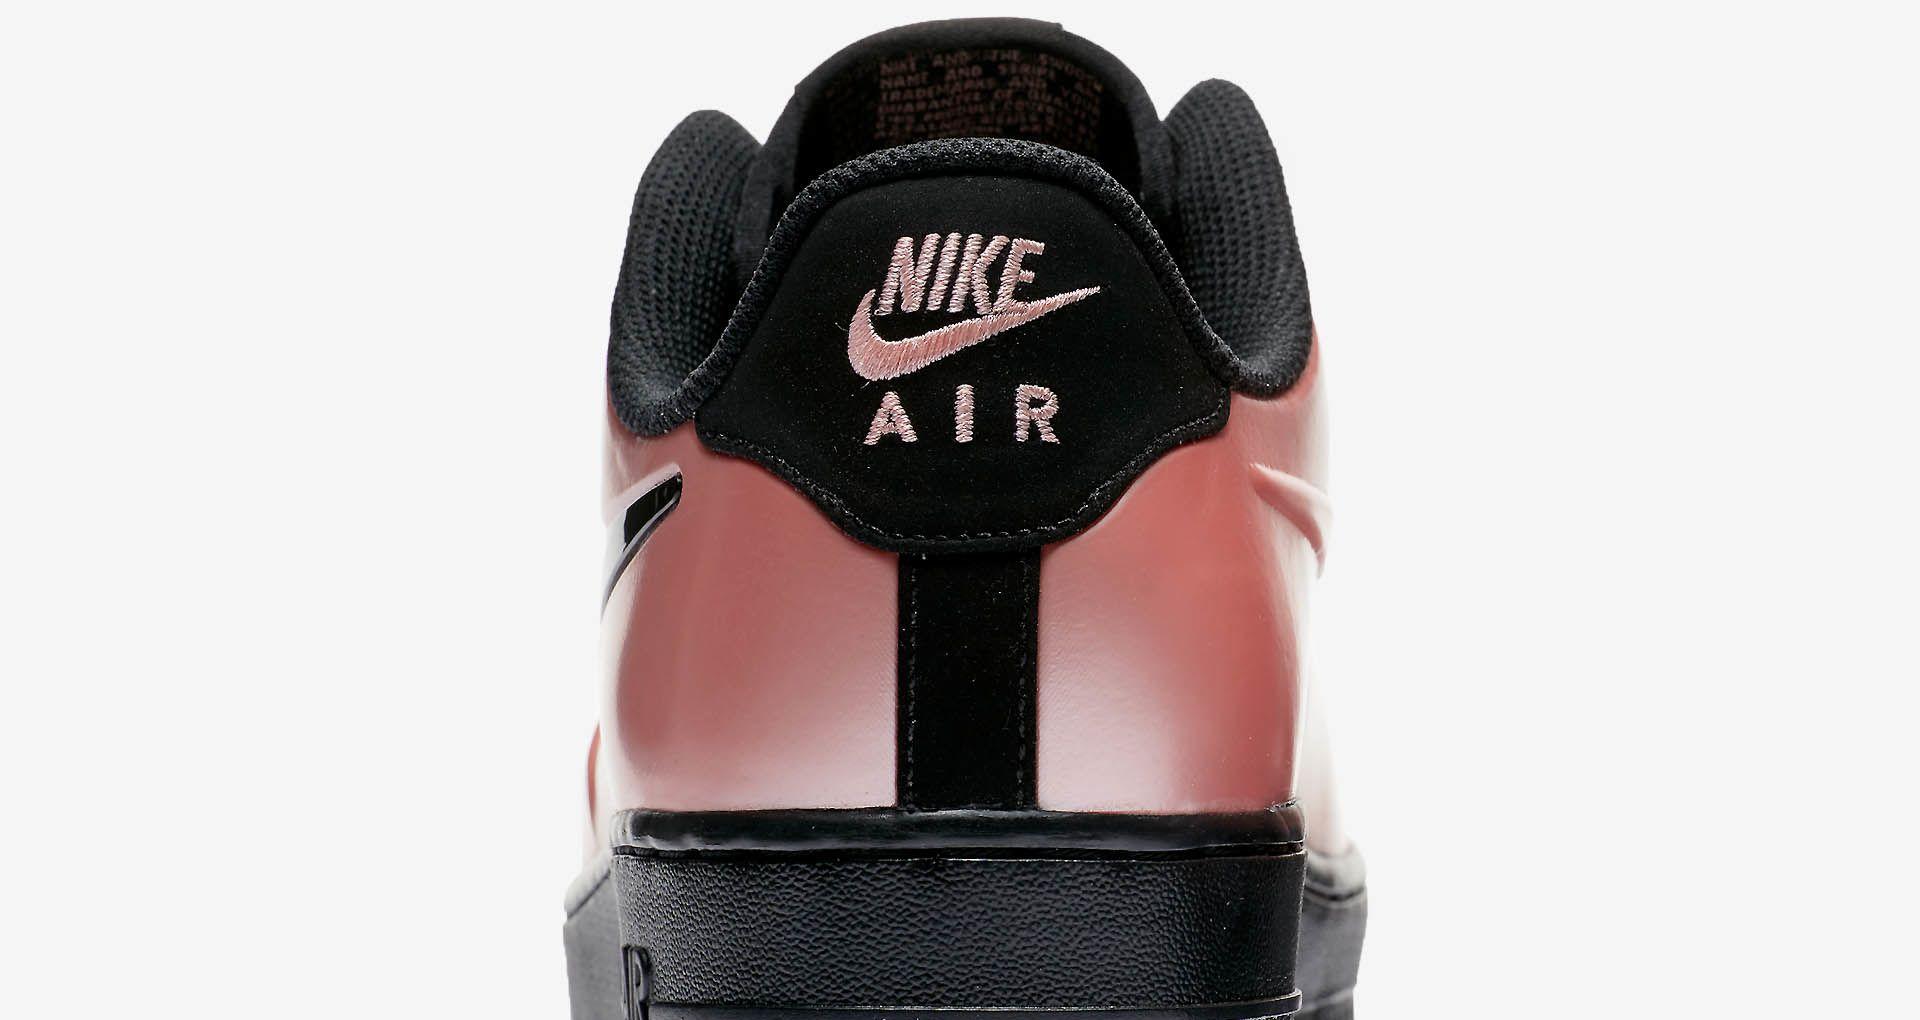 9cefa0e10990b Nike Air Force 1 Foamposite Pro Cup  Coral Stardust   Black  Release Date